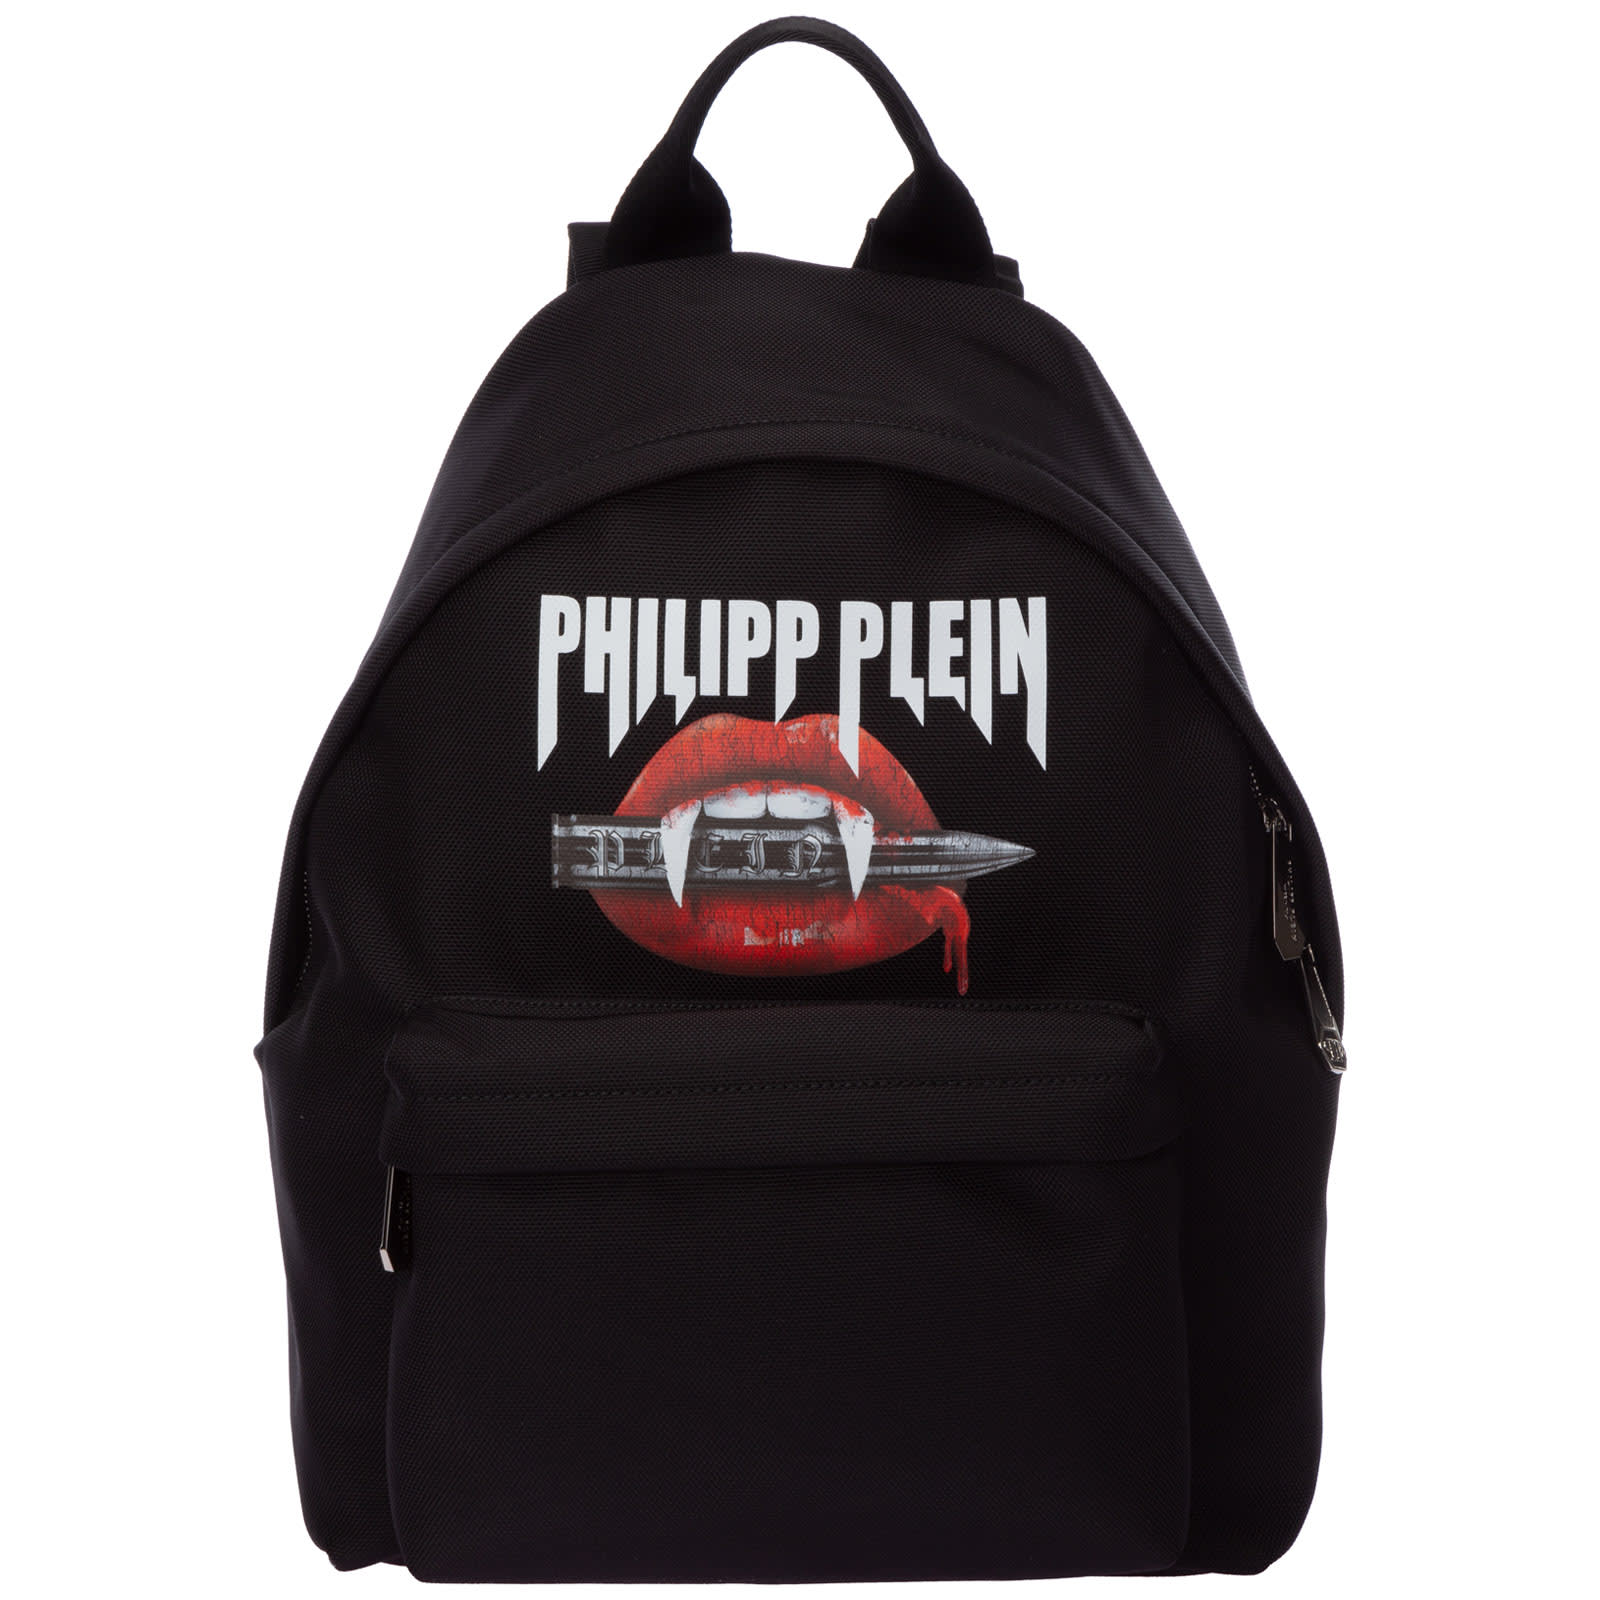 Philipp Plein Cross Backpack